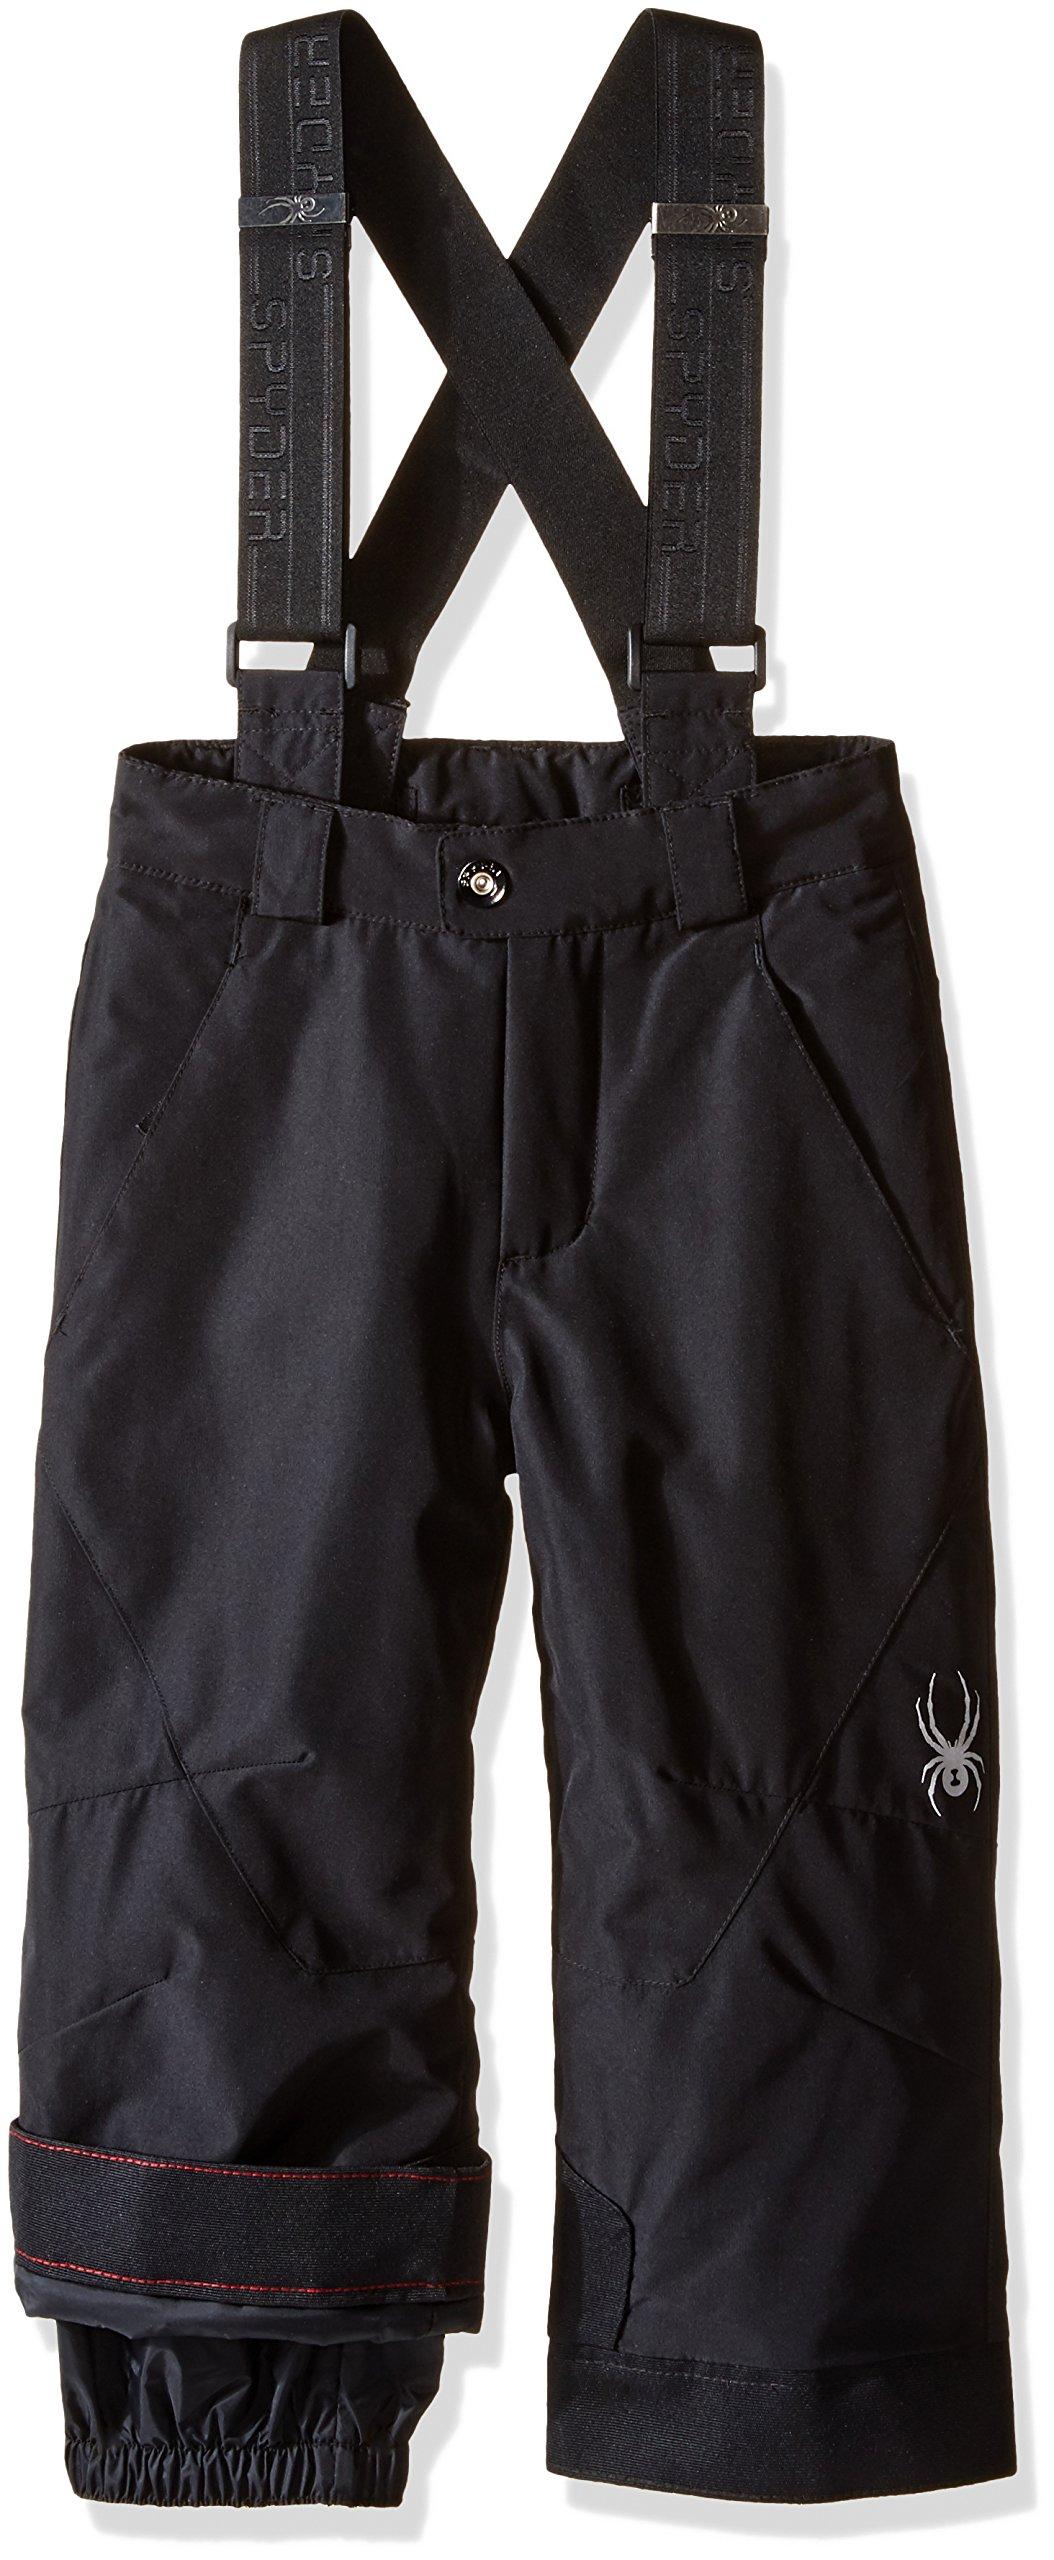 Spyder Boys Mini Propulsion Pants, Size 4, Black